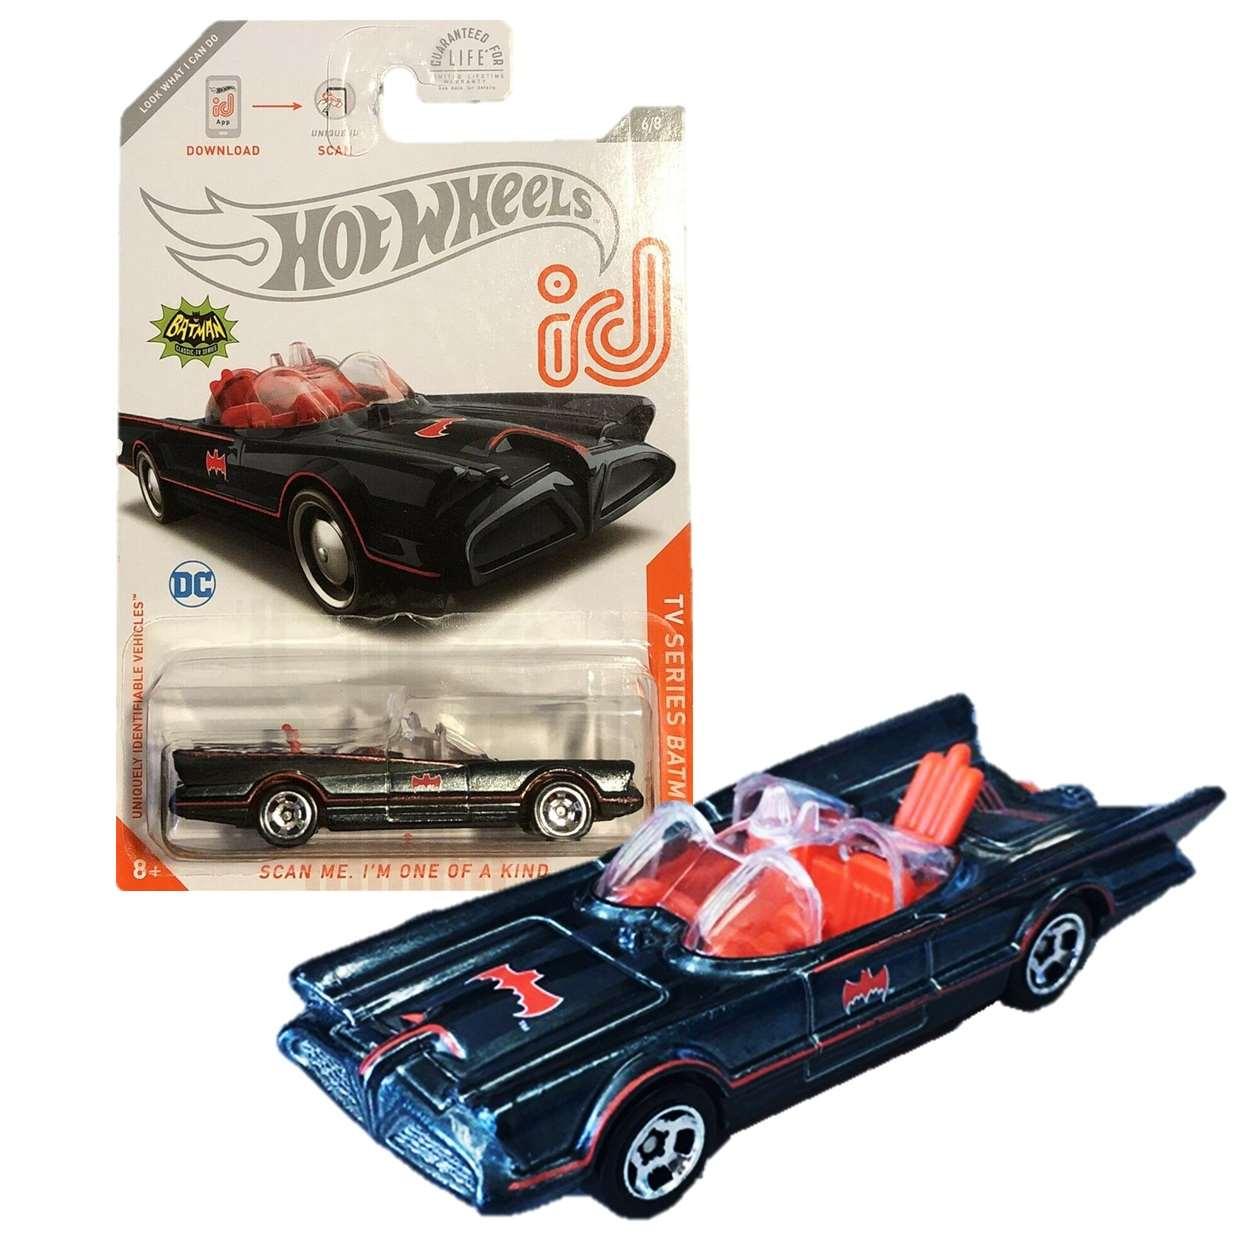 Batmobile Batman Classic Tv Series 6/8 Hot Wheels ID